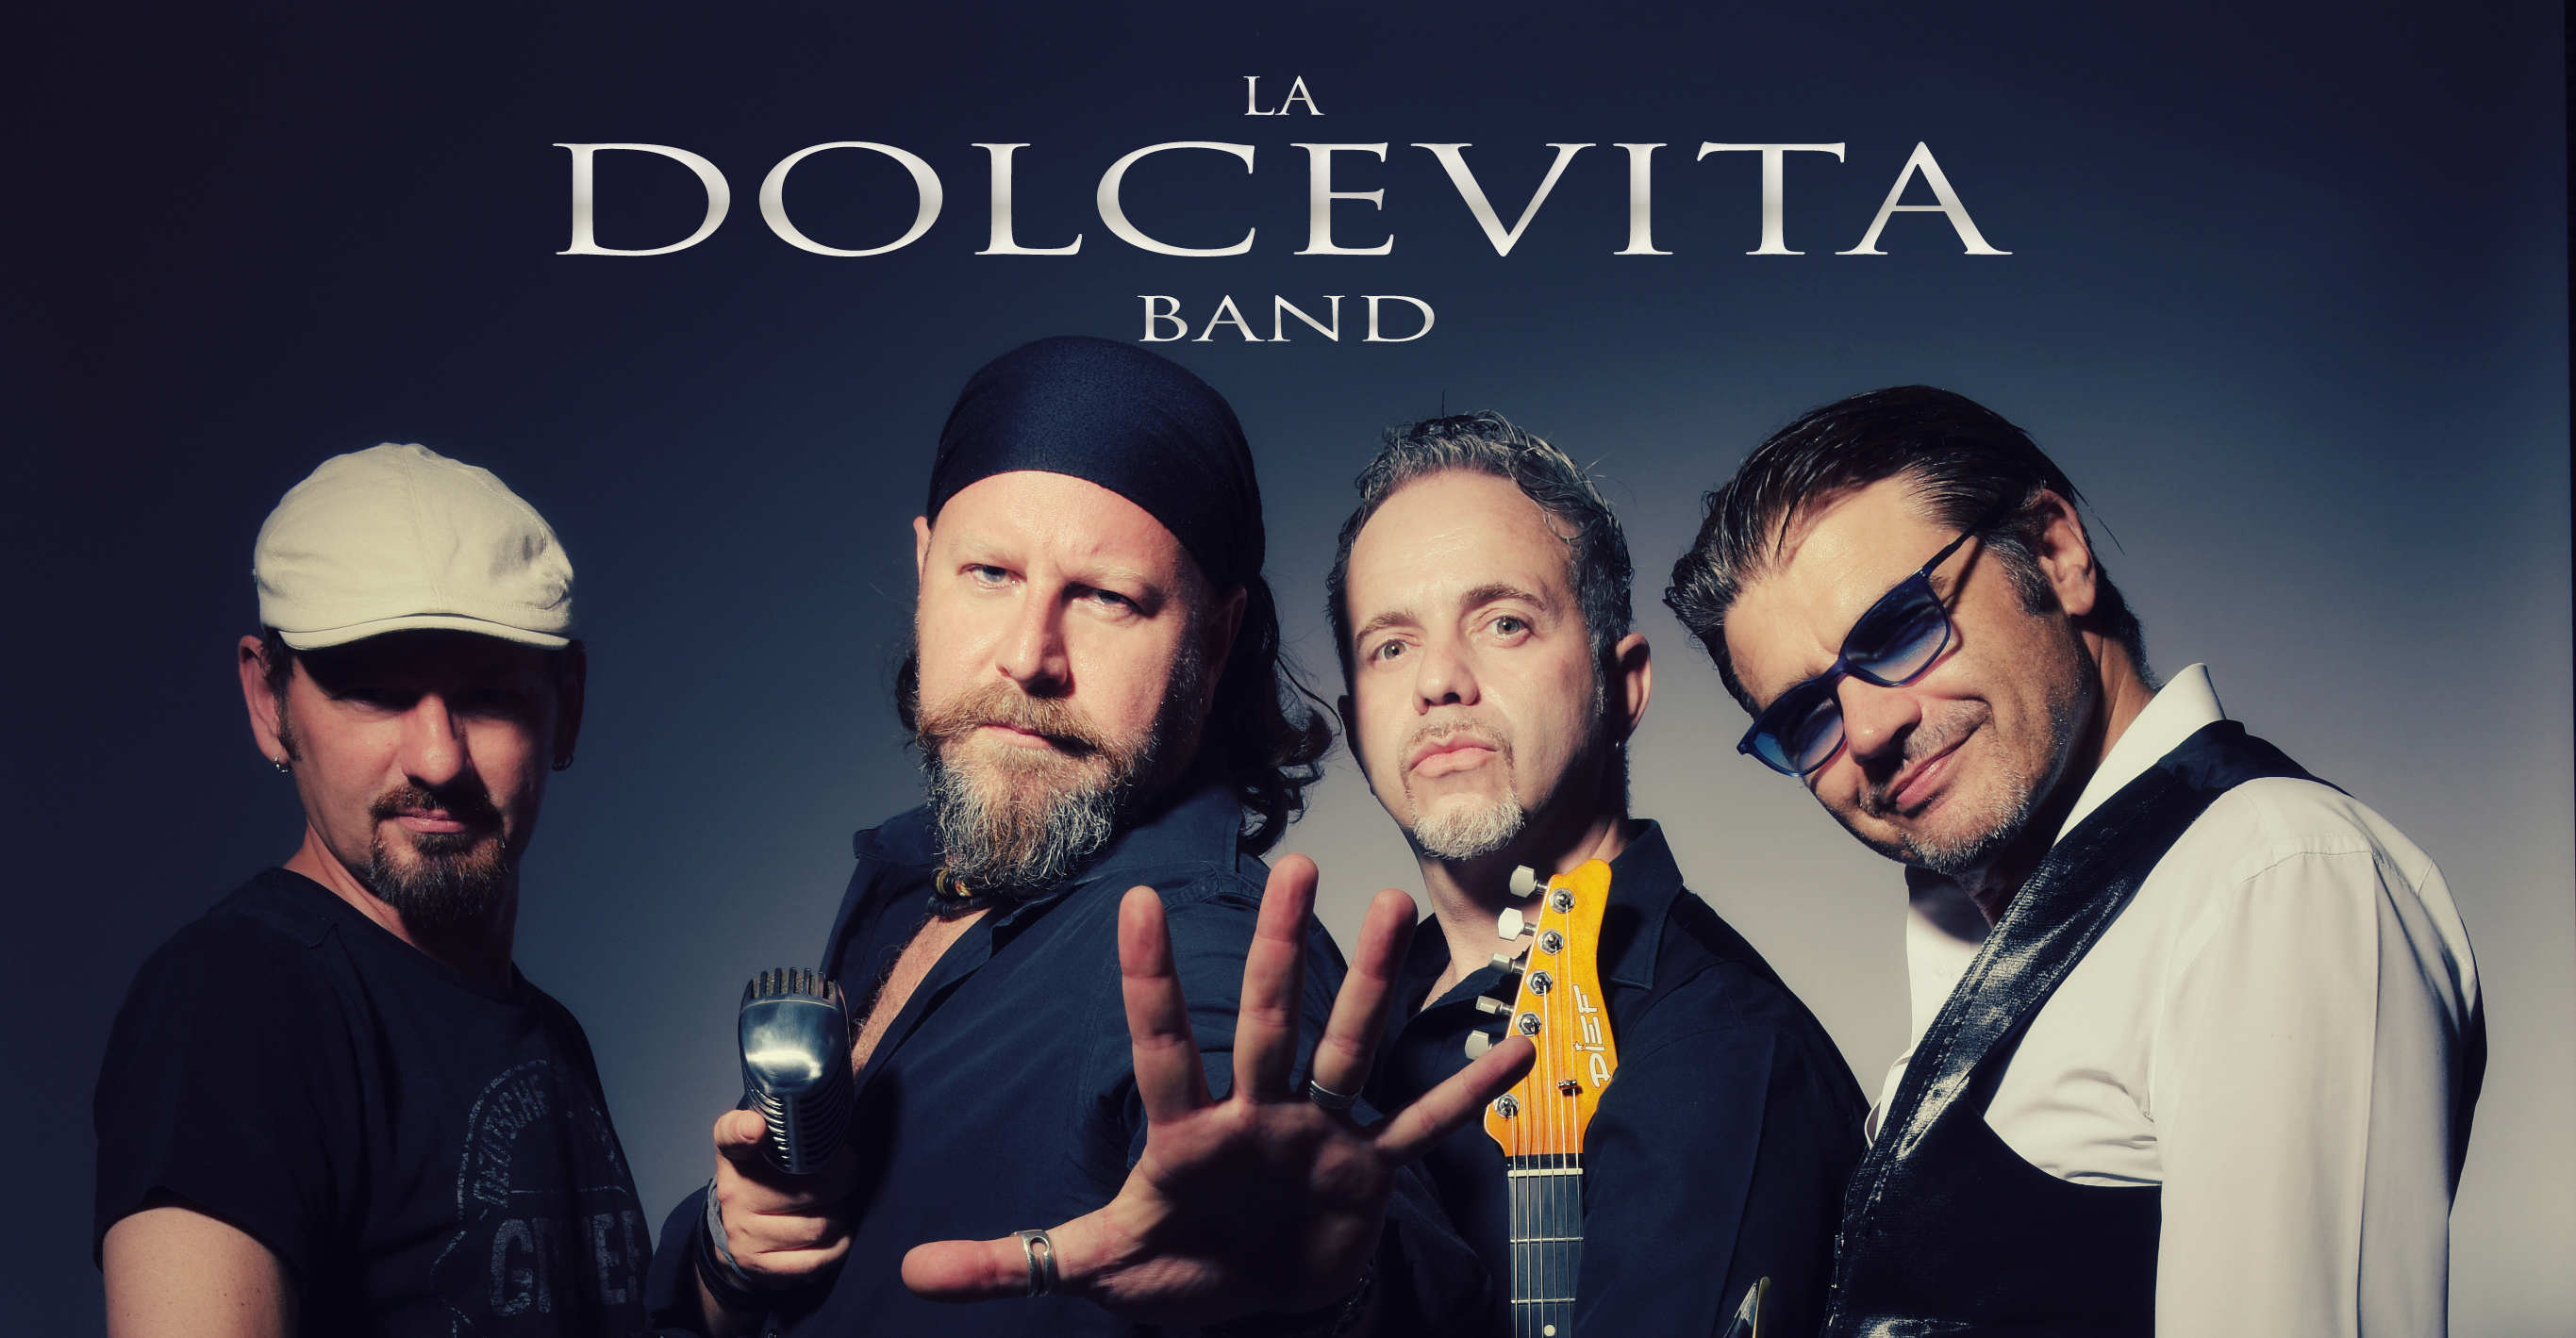 DolceVita Band